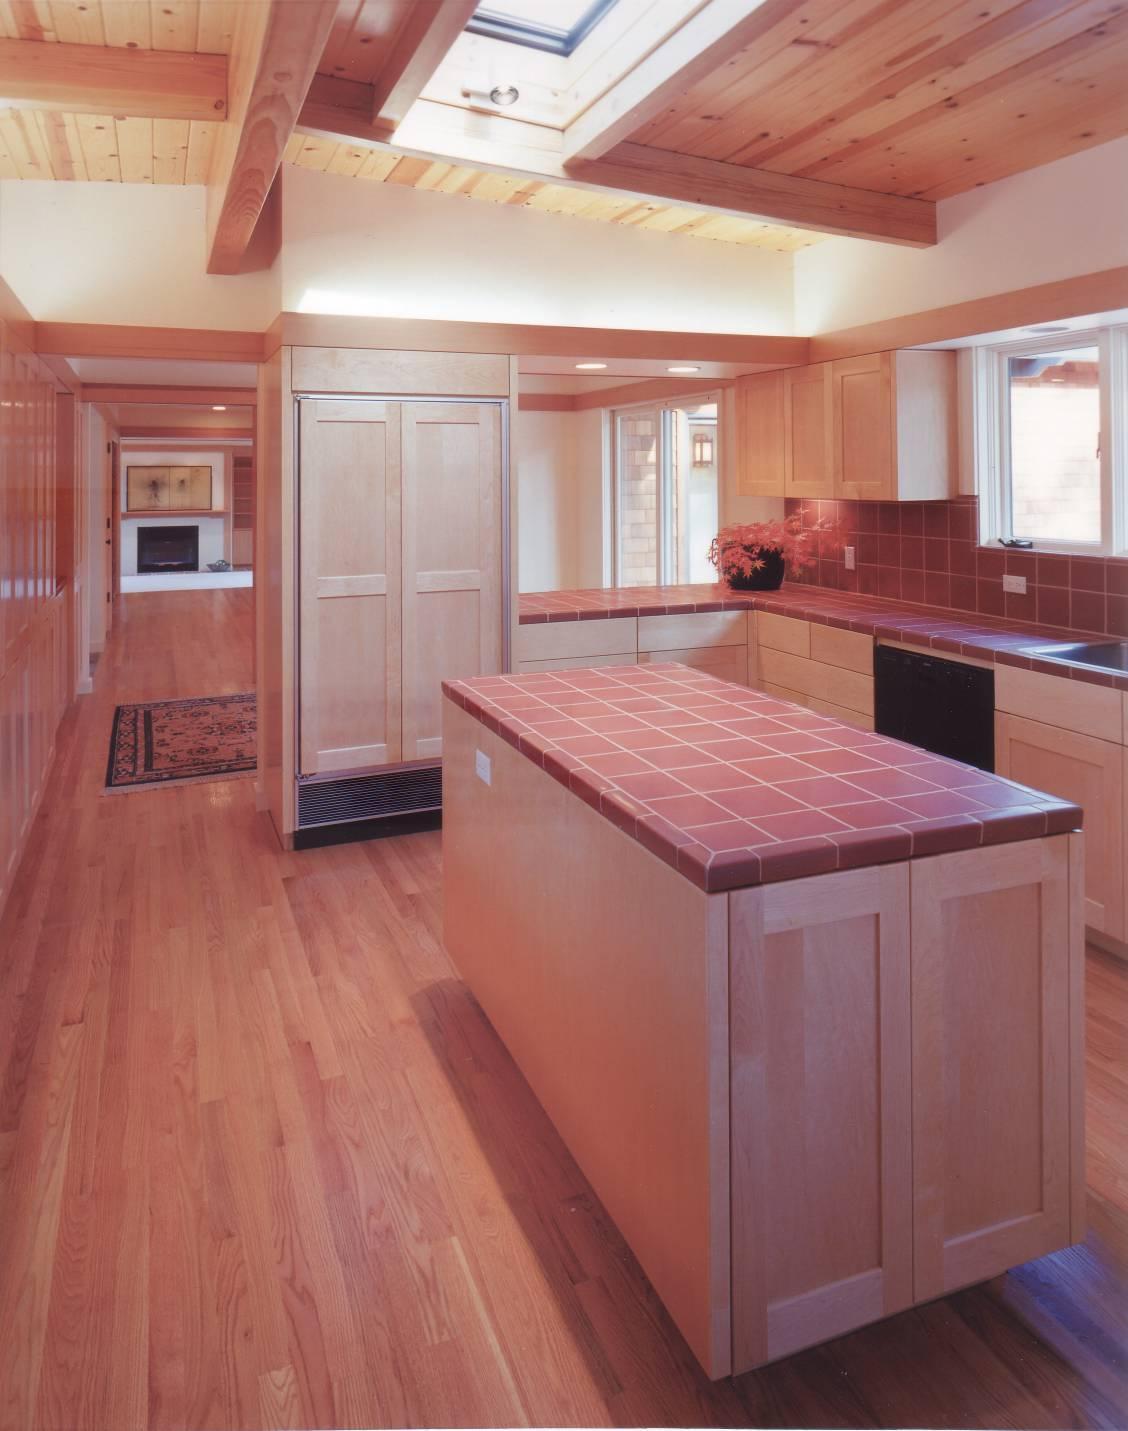 Japanese style kitchen with island light wood grain, interior design, best architect work, Los Altos Hills